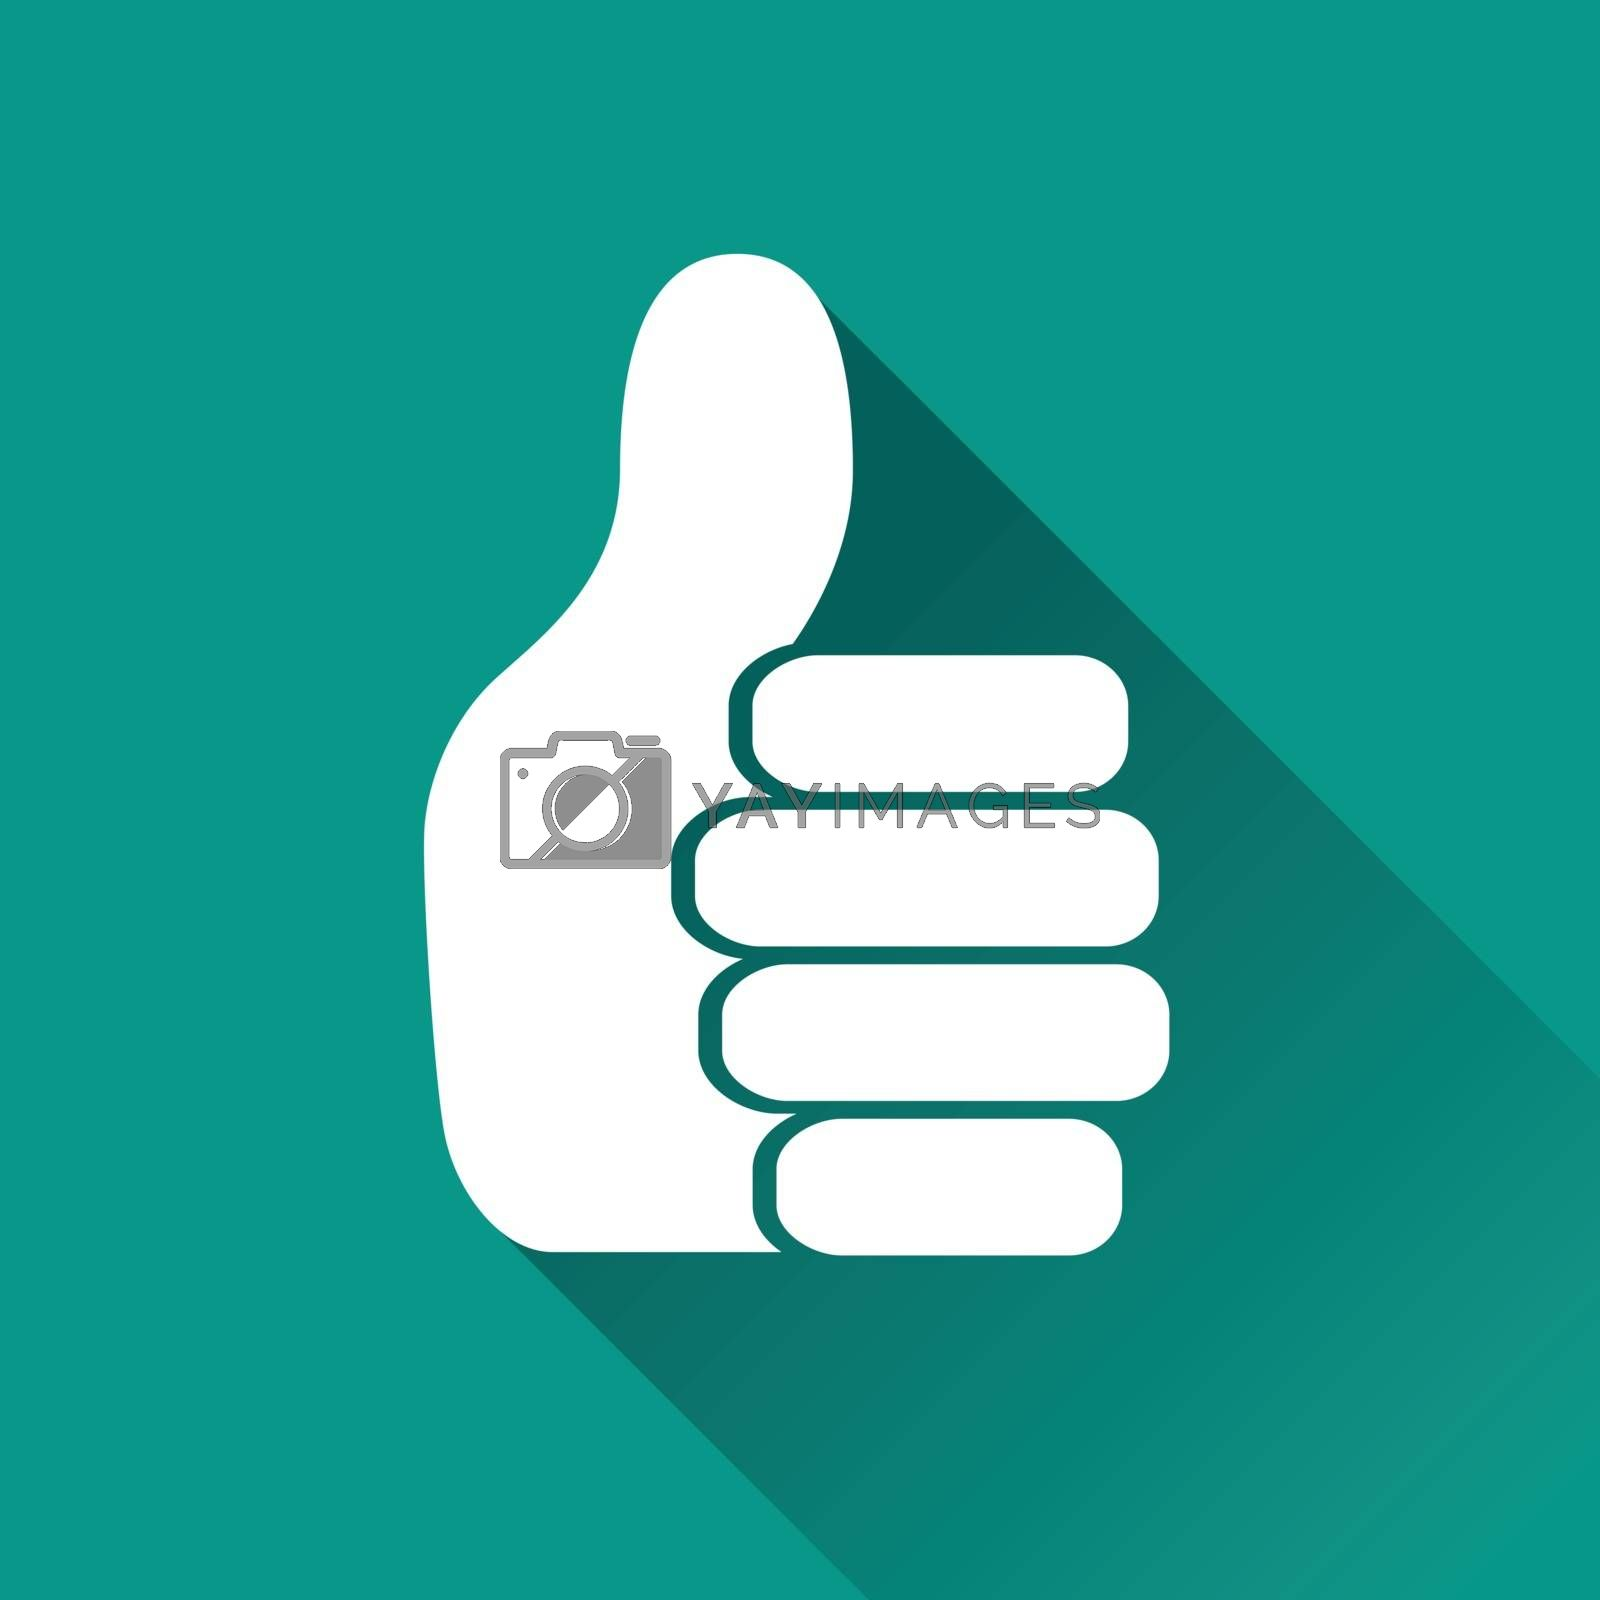 Royalty free image of thumb flat design icon by nickylarson974